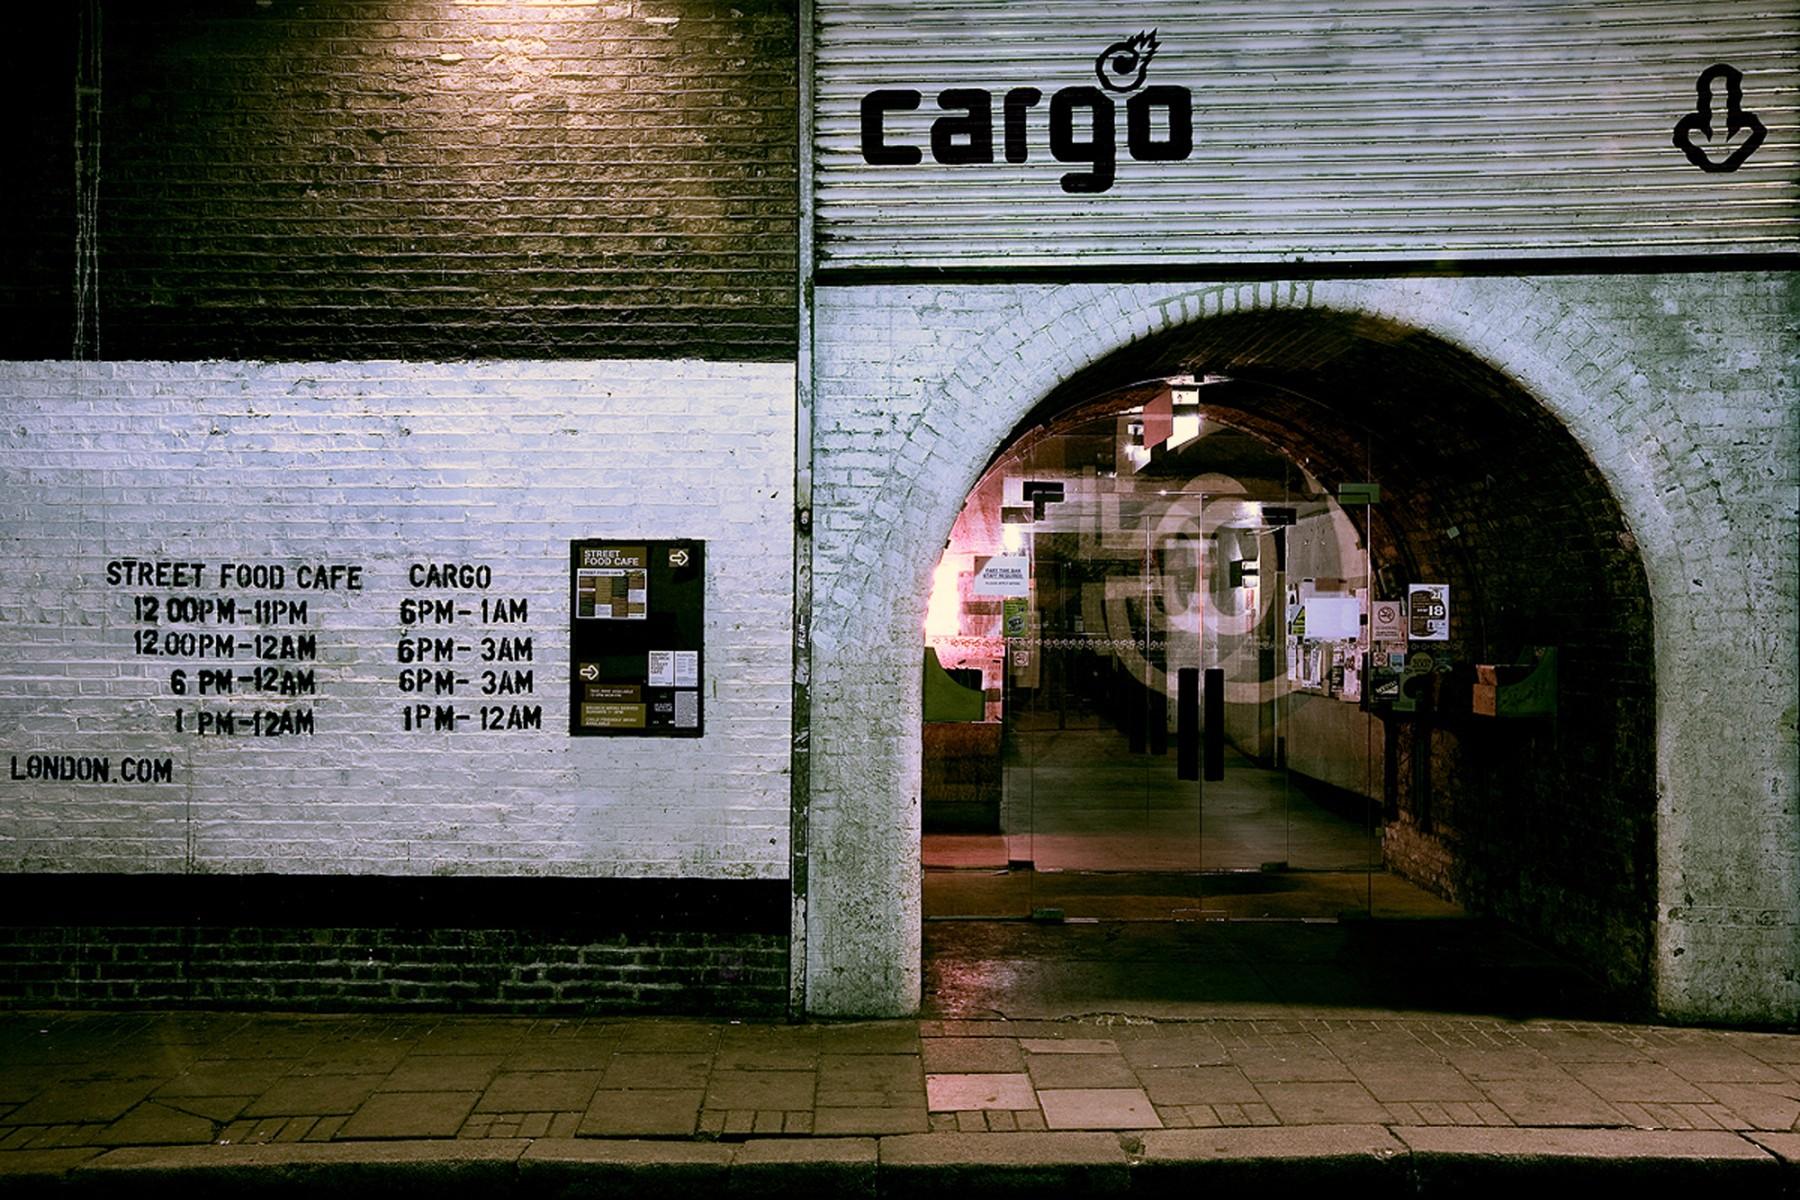 Cargo-East-London-Shoreditch-cultural-scene-bar-restaurant-urban-disused-railway-yard-entertainment-venue-events-Jamie-Fobert-Architects-6